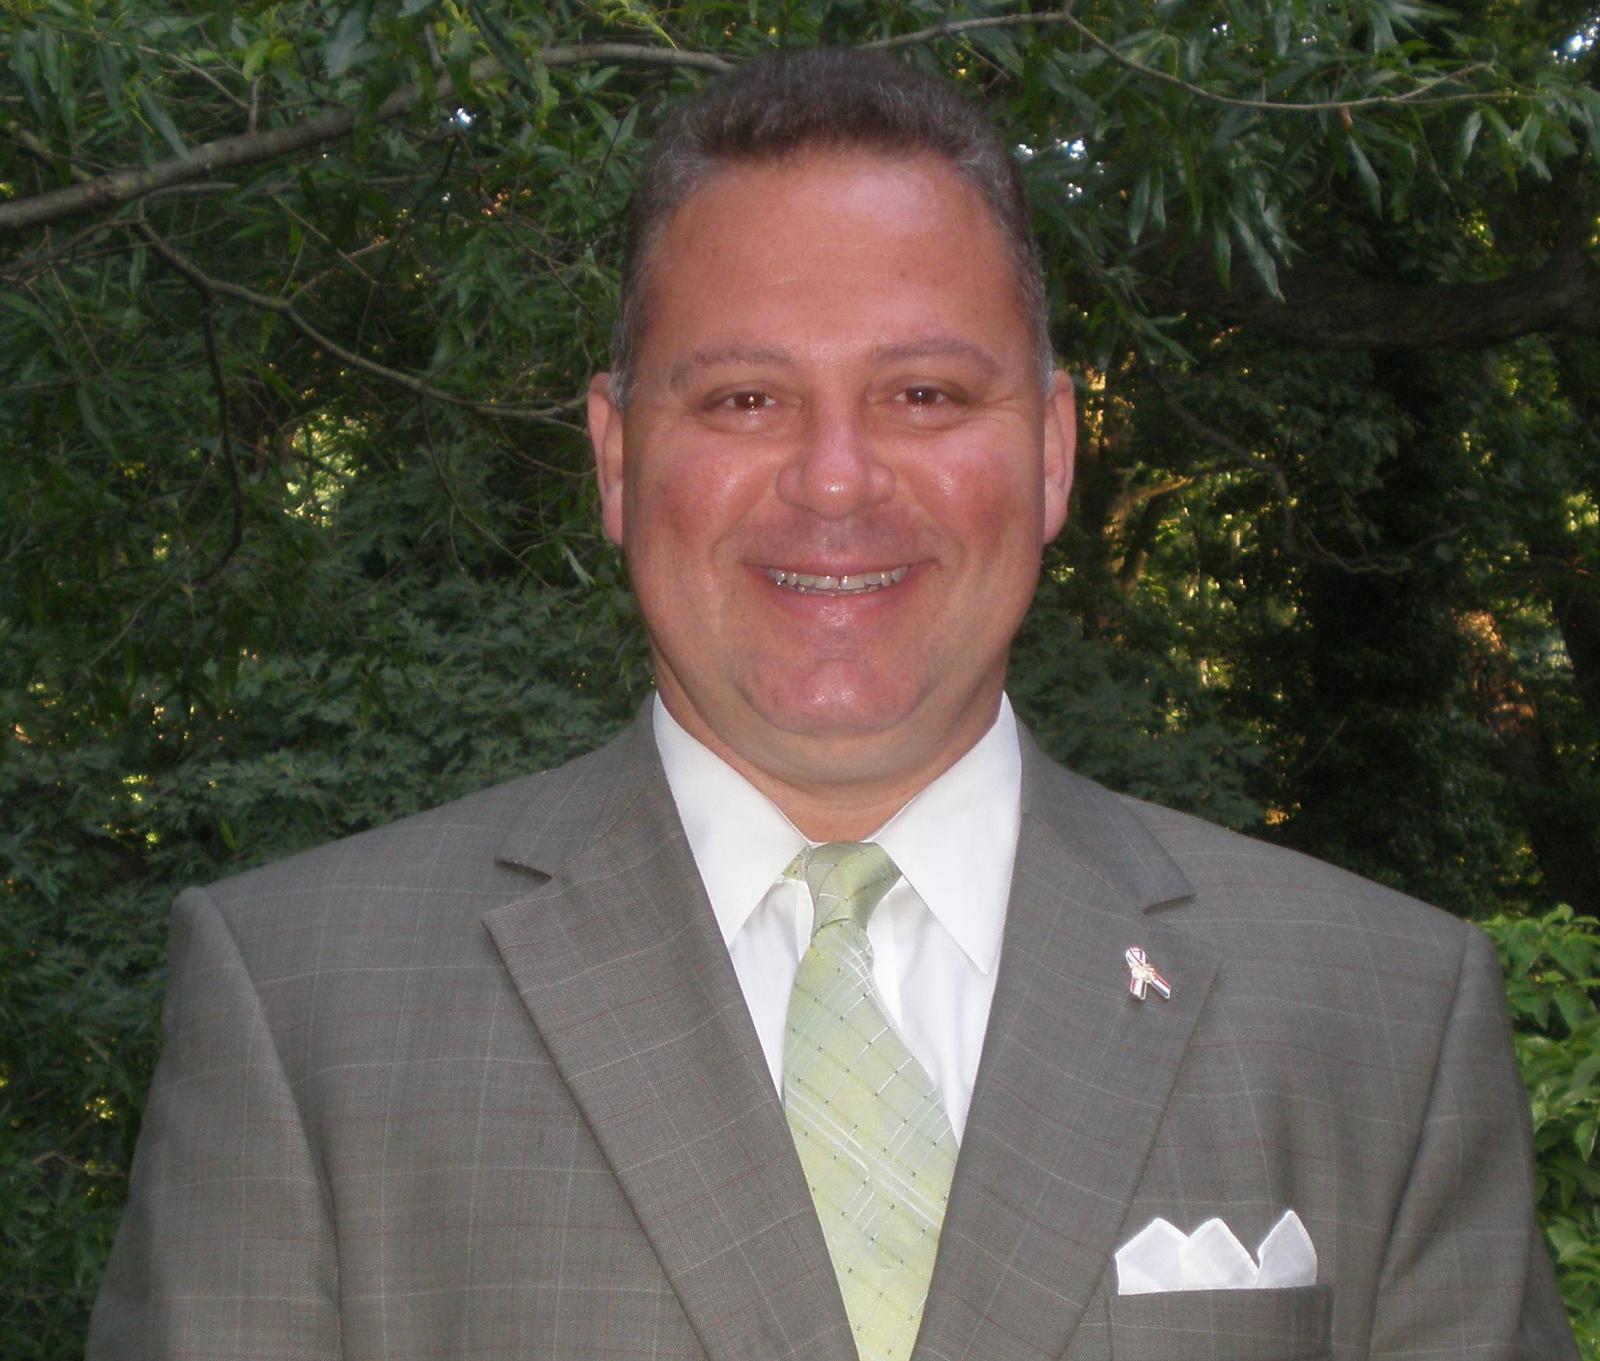 John Wilford Farina | Washington, DC | Morgan Stanley Wealth